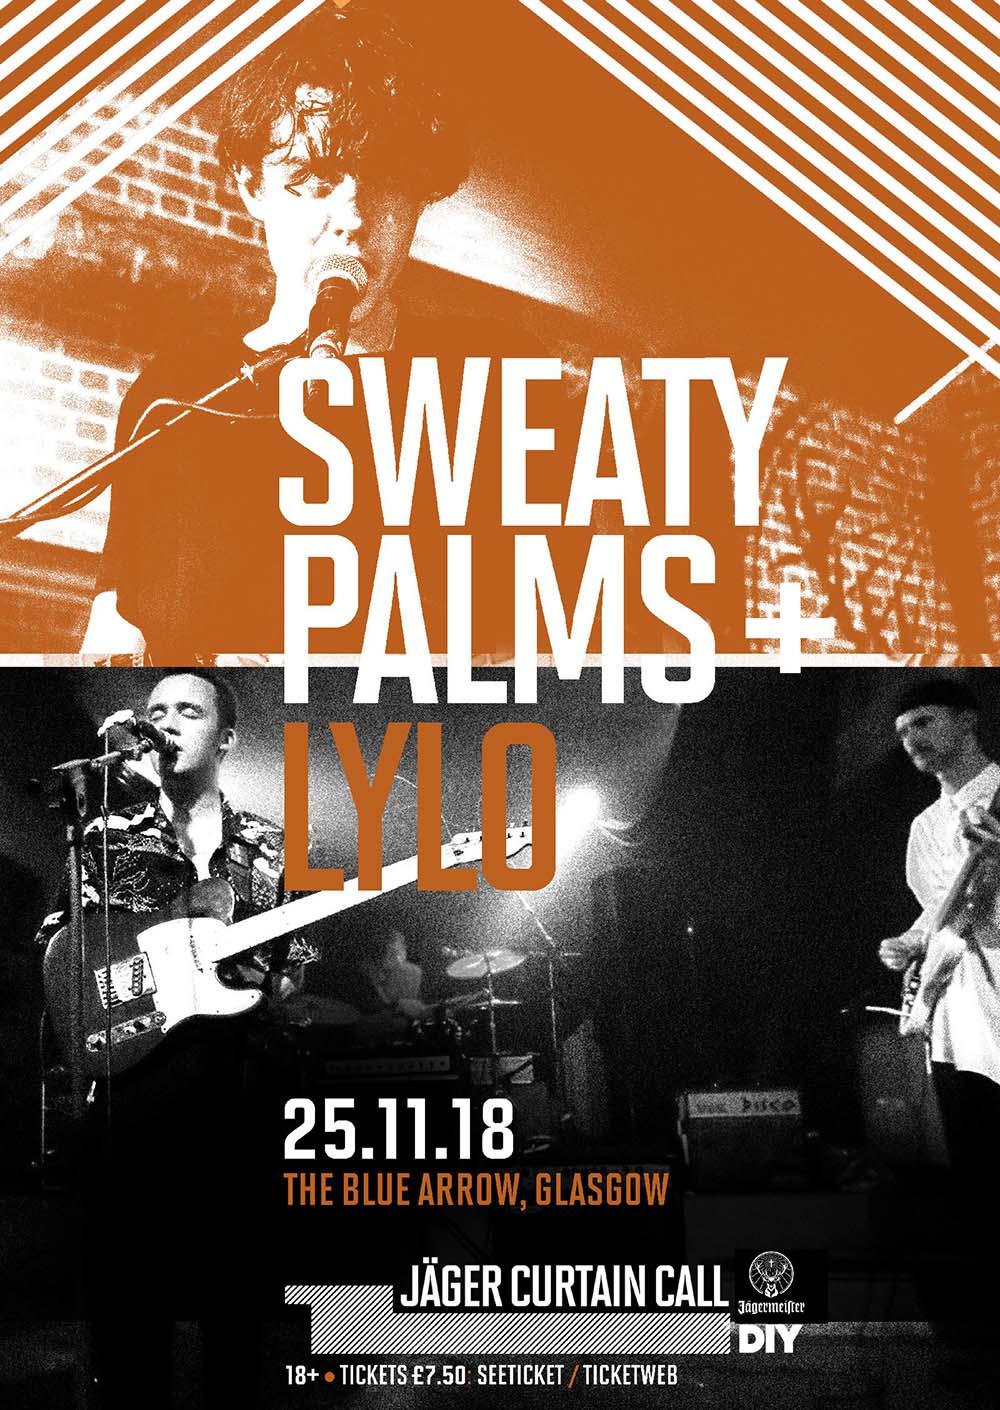 Sweaty Palms and Lylo to play Glasgow's Blue Arrow for Jäger Curtain Call 2018